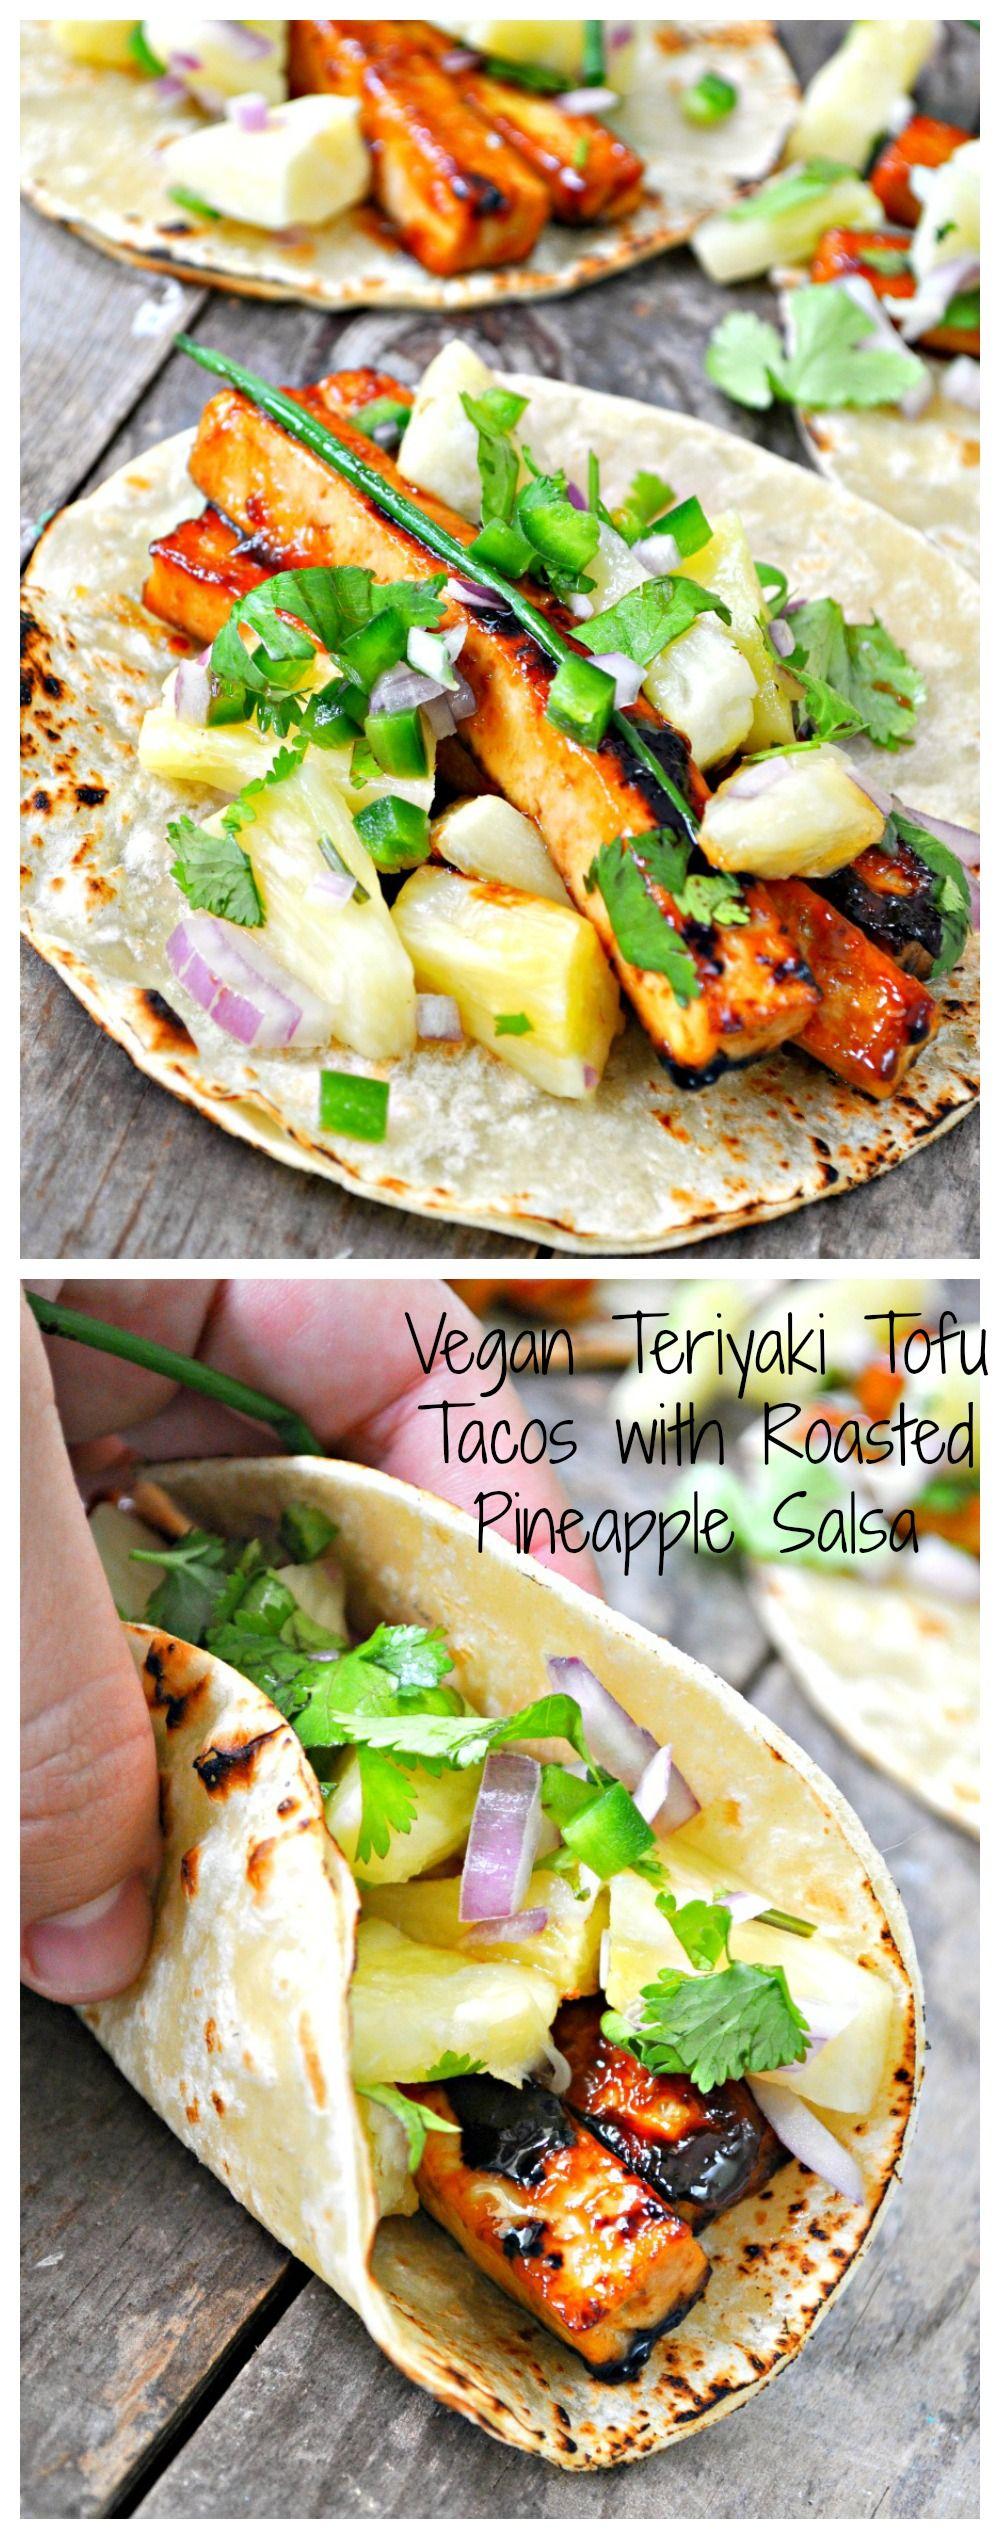 Vegan Teriyaki Tofu Tacos with Roasted Pineapple Salsa